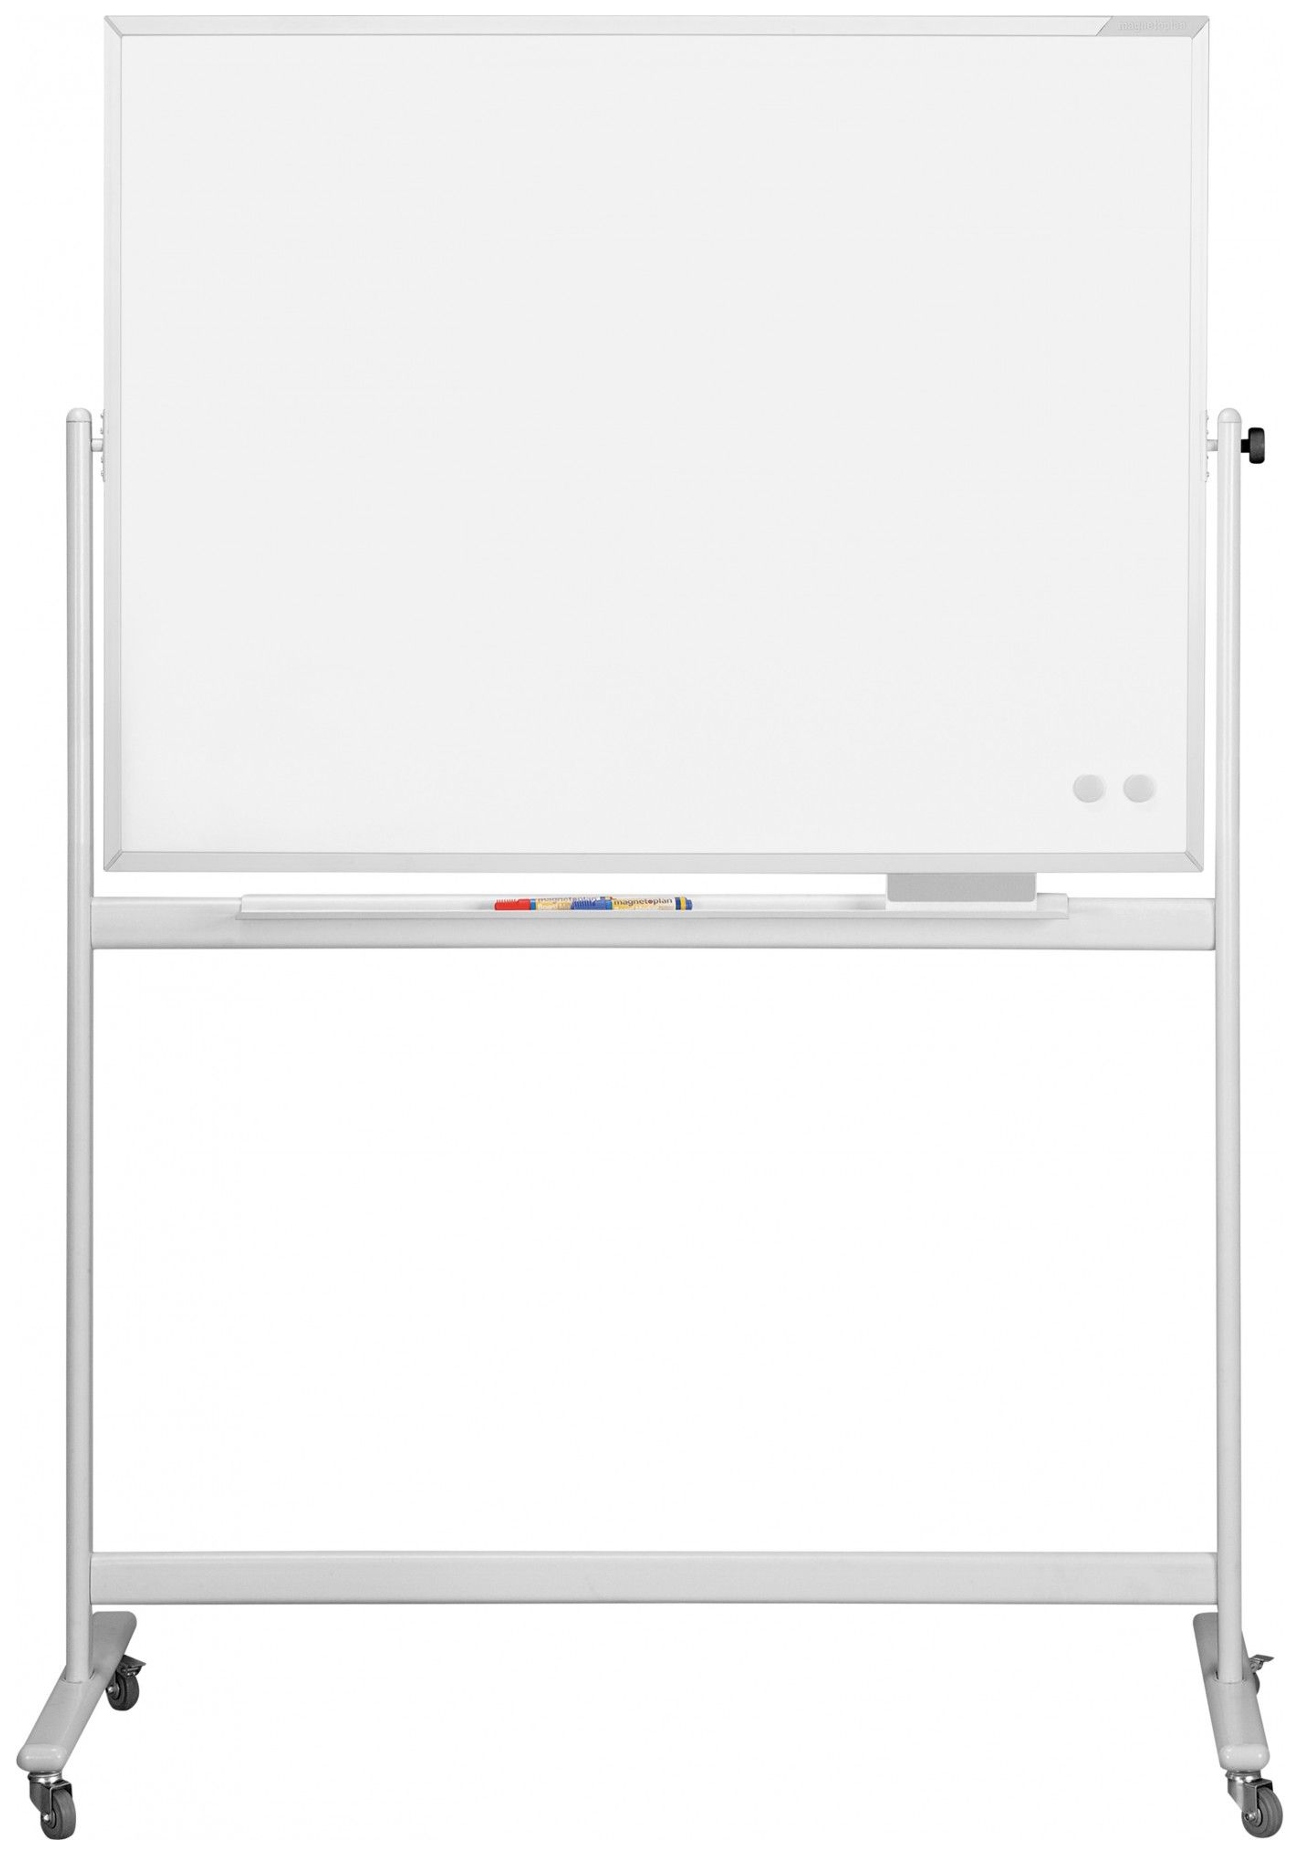 Доска мобильная Magnetoplan SP 1500х100 0мм Лаковая, белая, вращающаяся фото